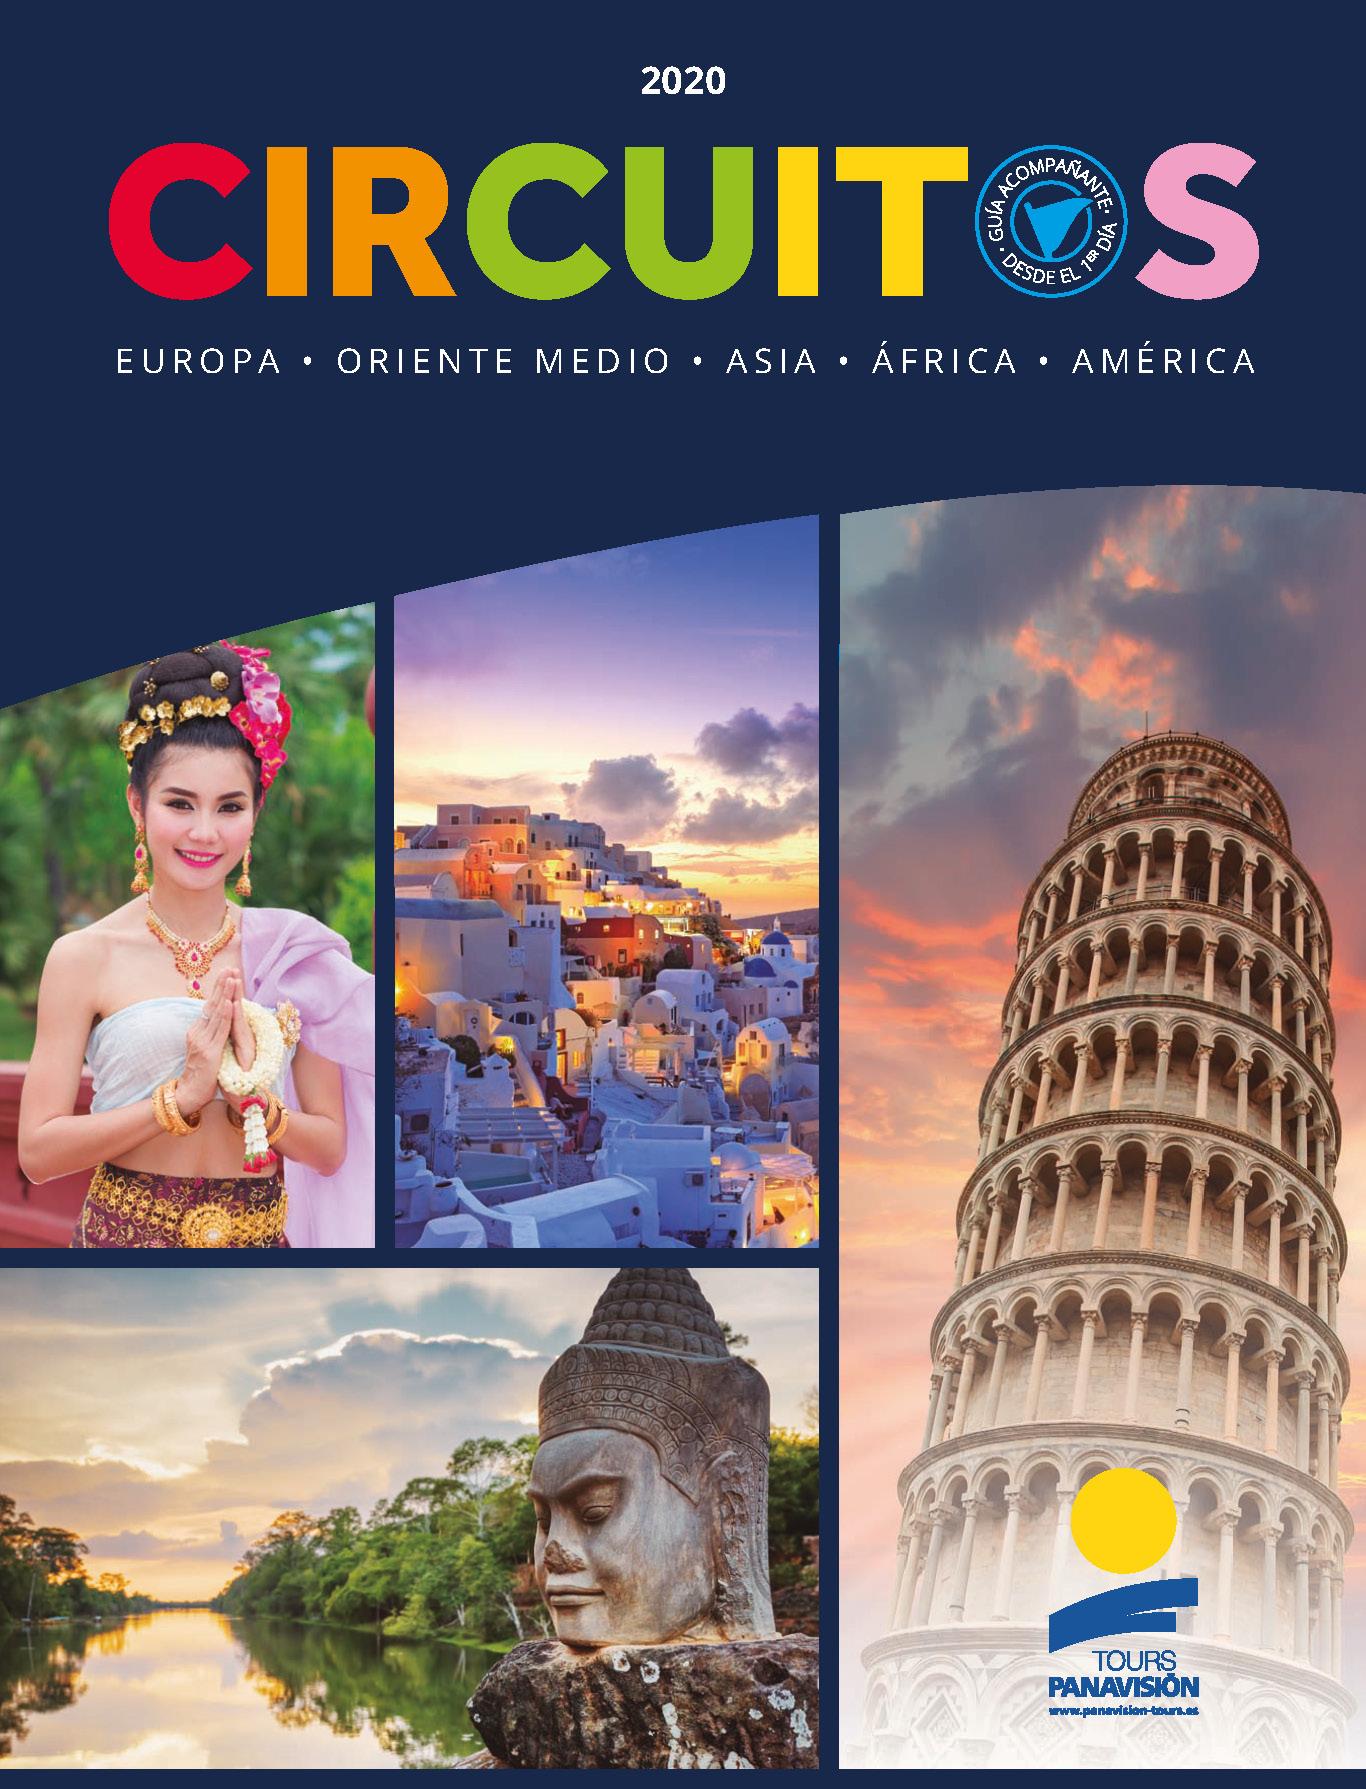 Catalogo Panavision Tours Circuitos Europa Oriente Medio Asia Africa America 2020 FG0